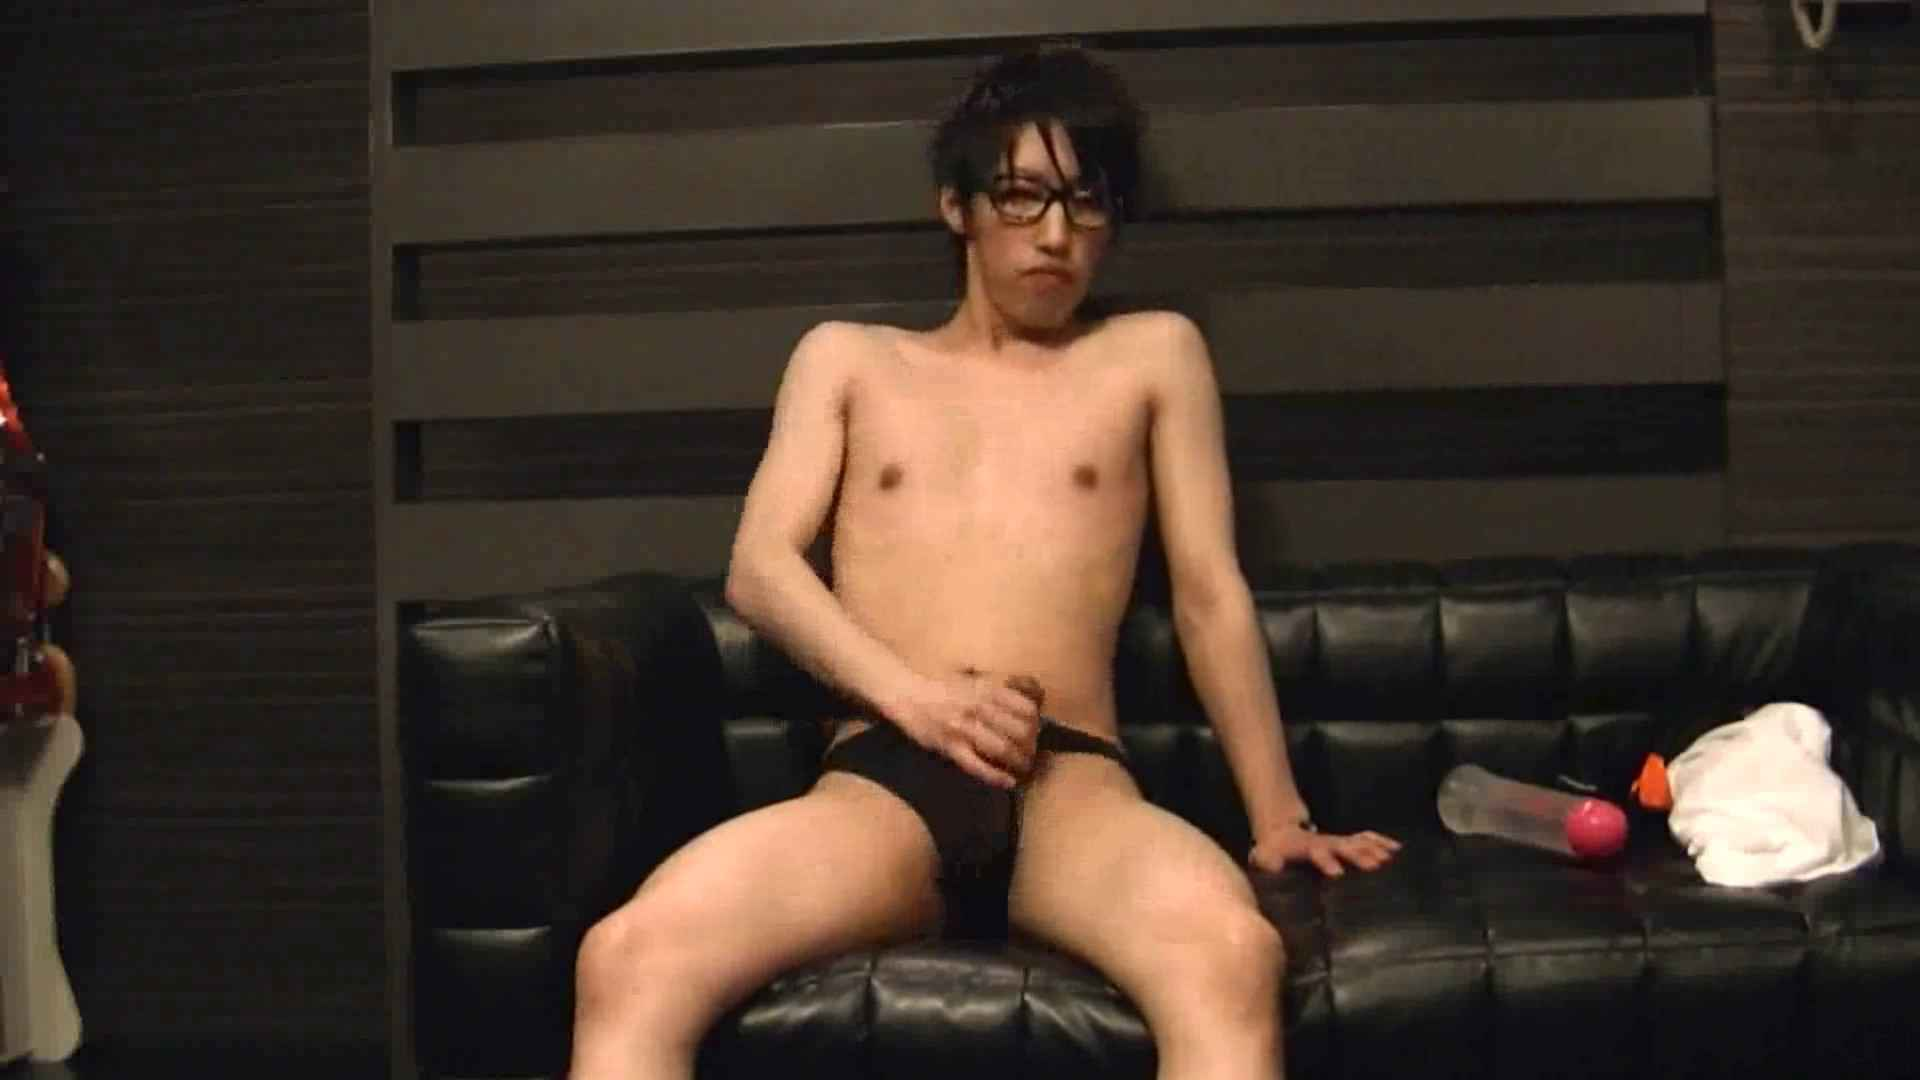 ONA見せカーニバル!! Vol3 モザ無し ゲイ無修正画像 87枚 36